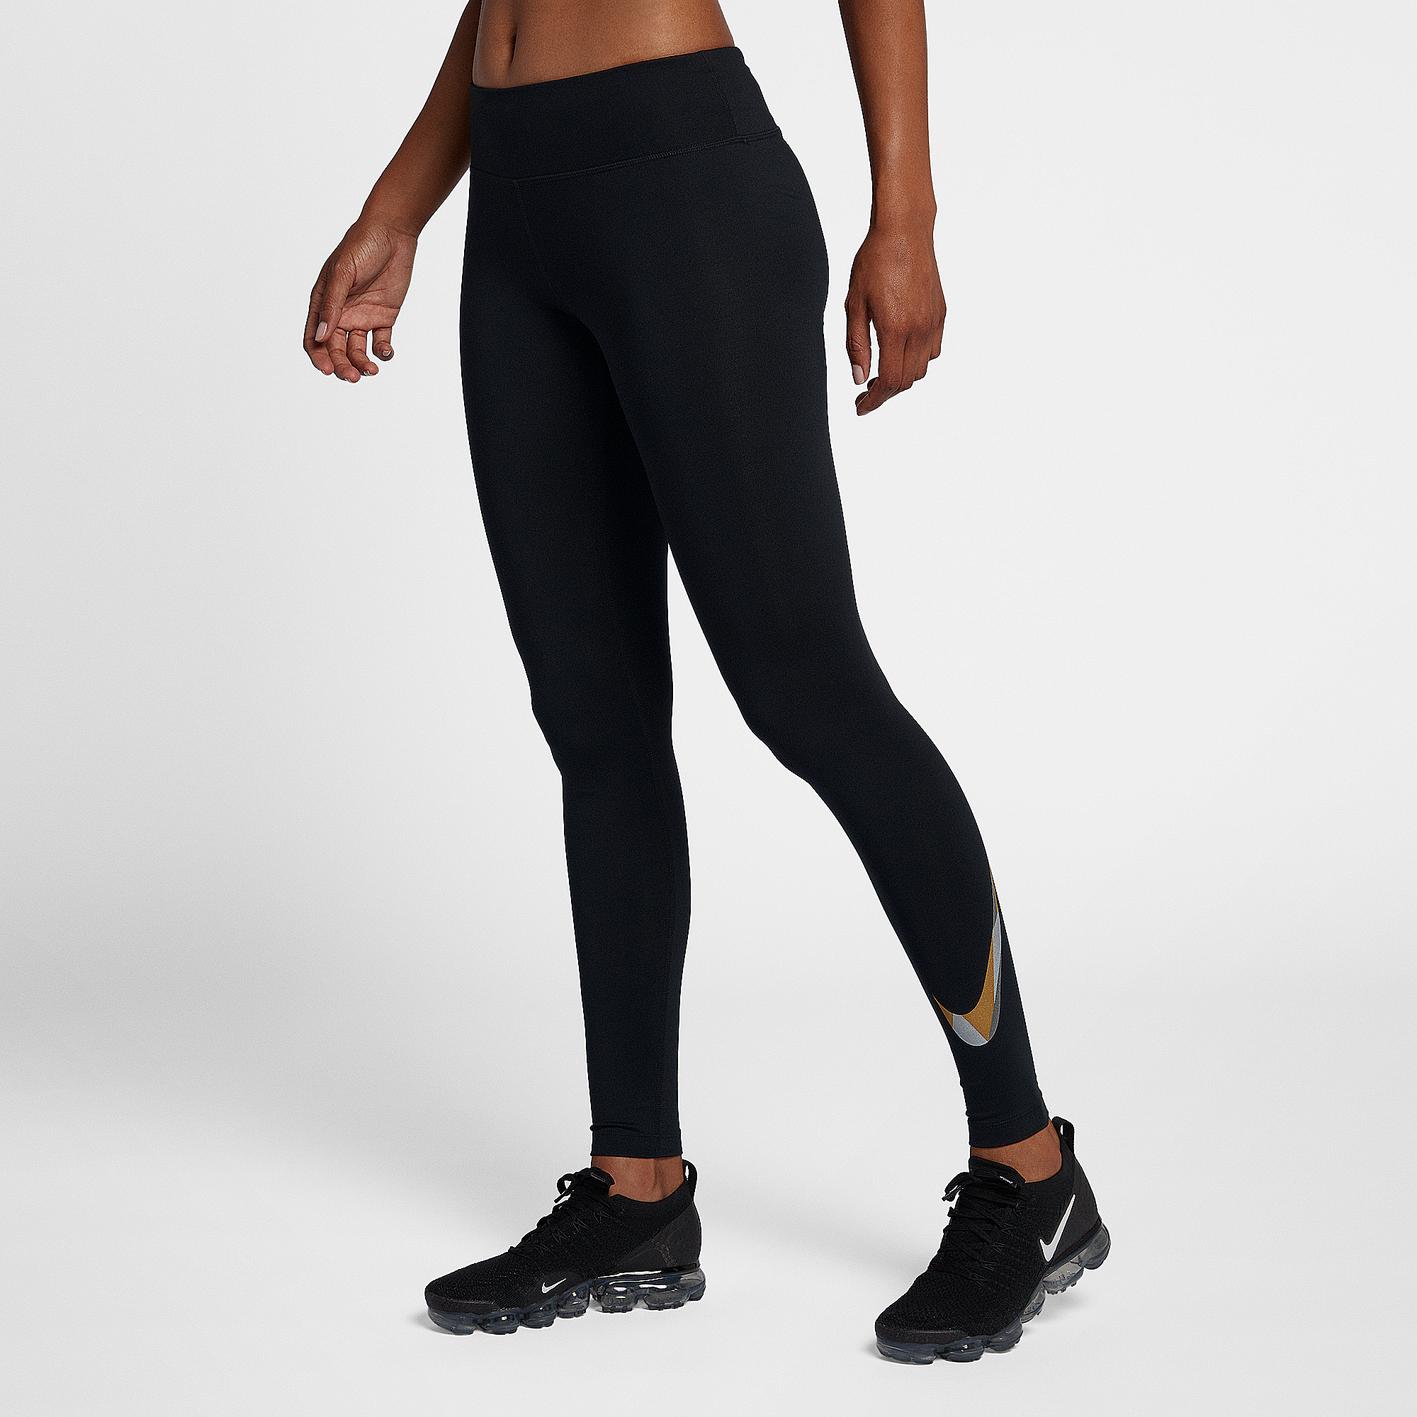 5283d8db8de Nike Flash Essential Tights - Women s - Running - Clothing - Black ...